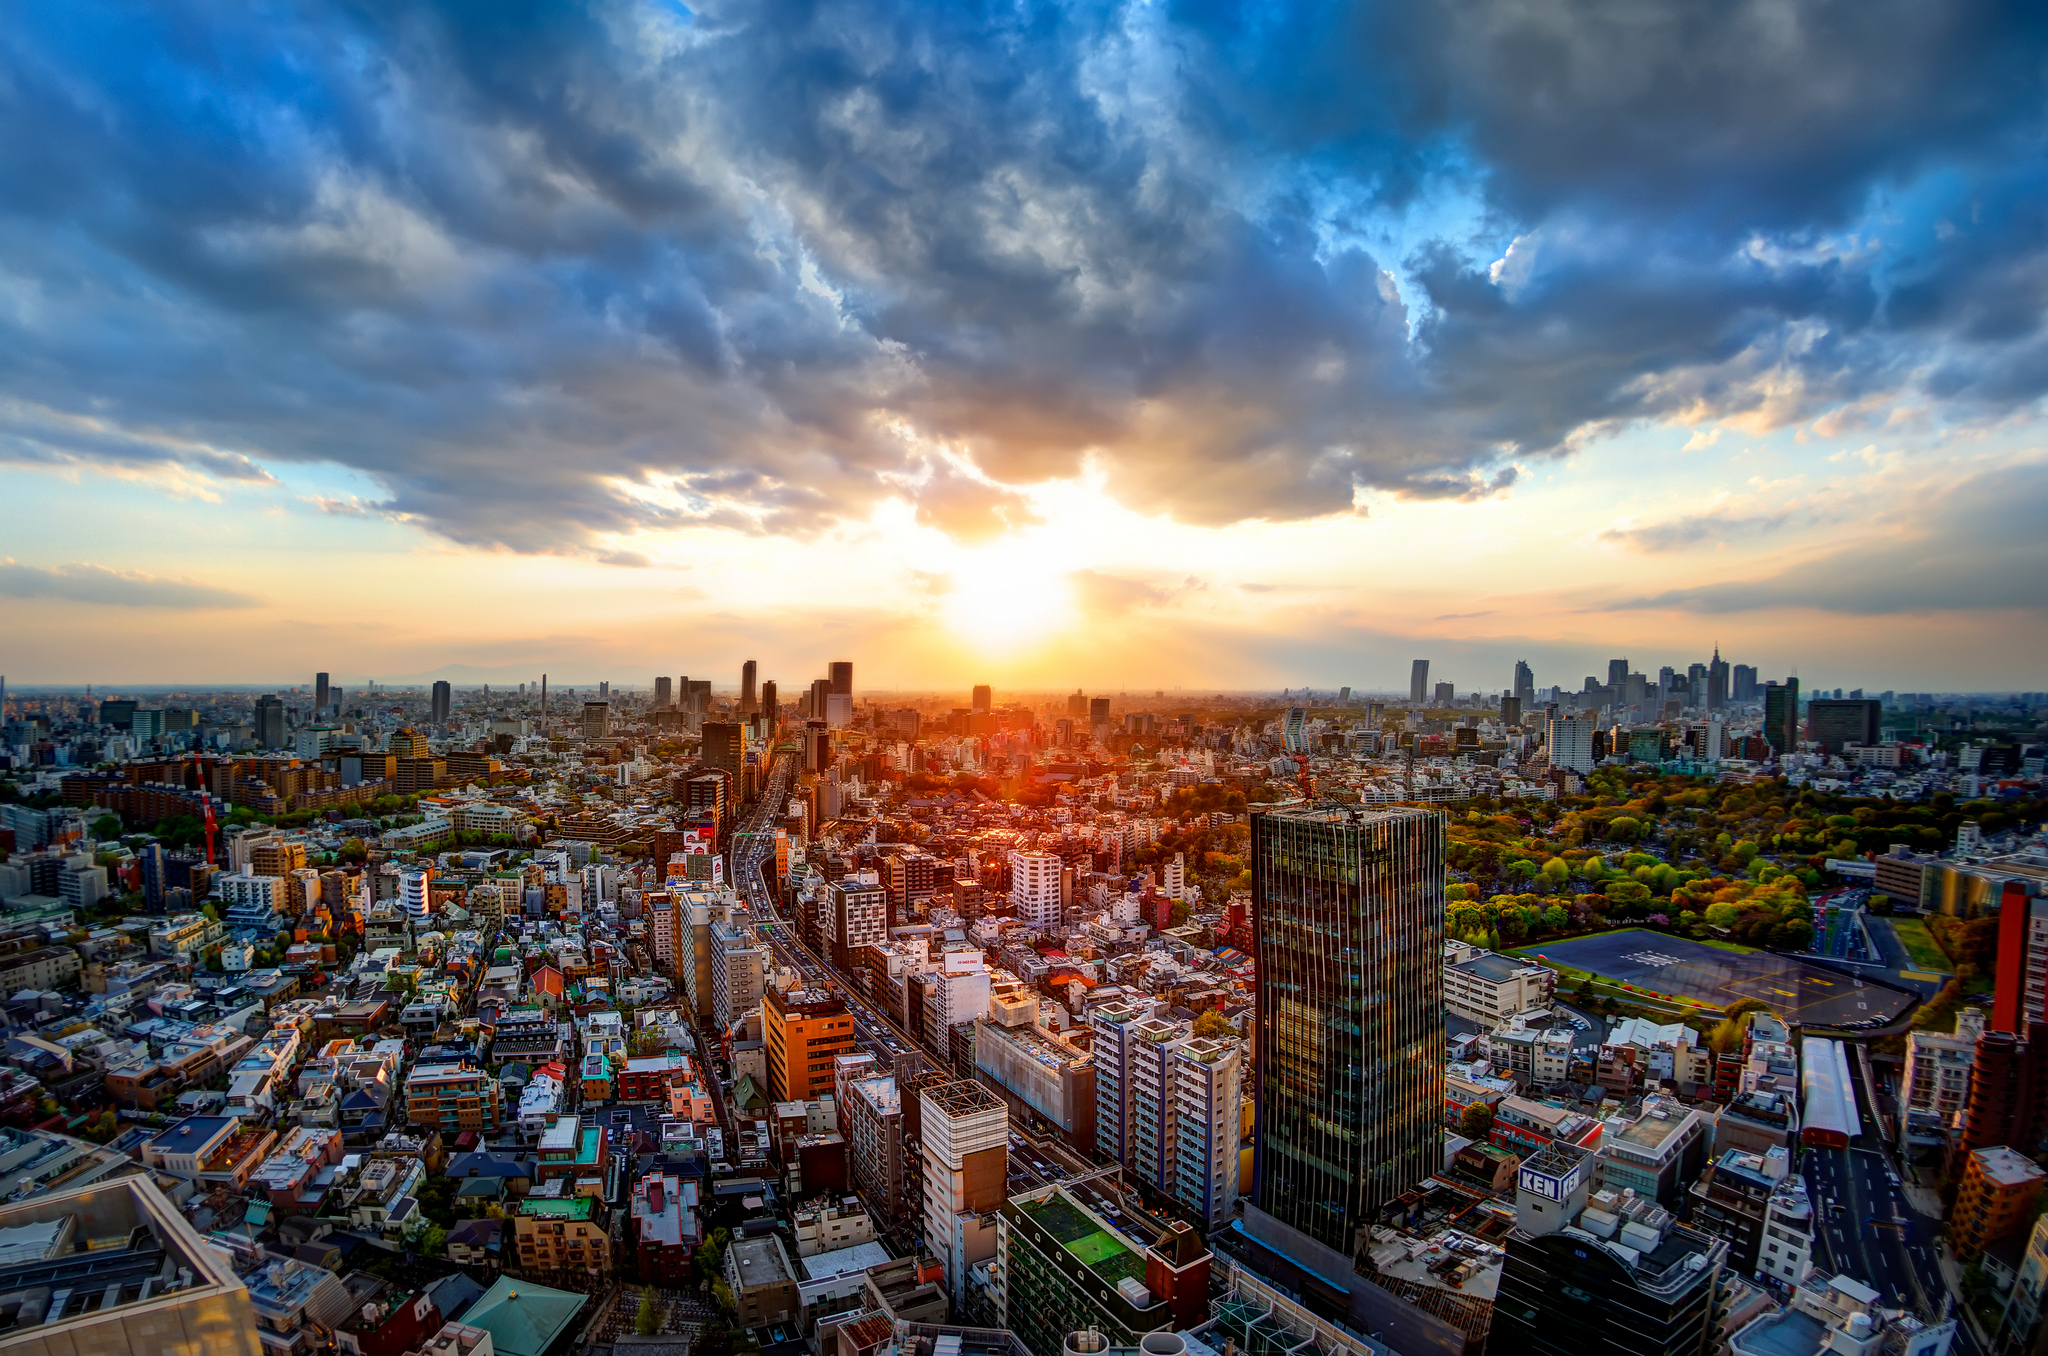 The Tokyo skyline at sunset